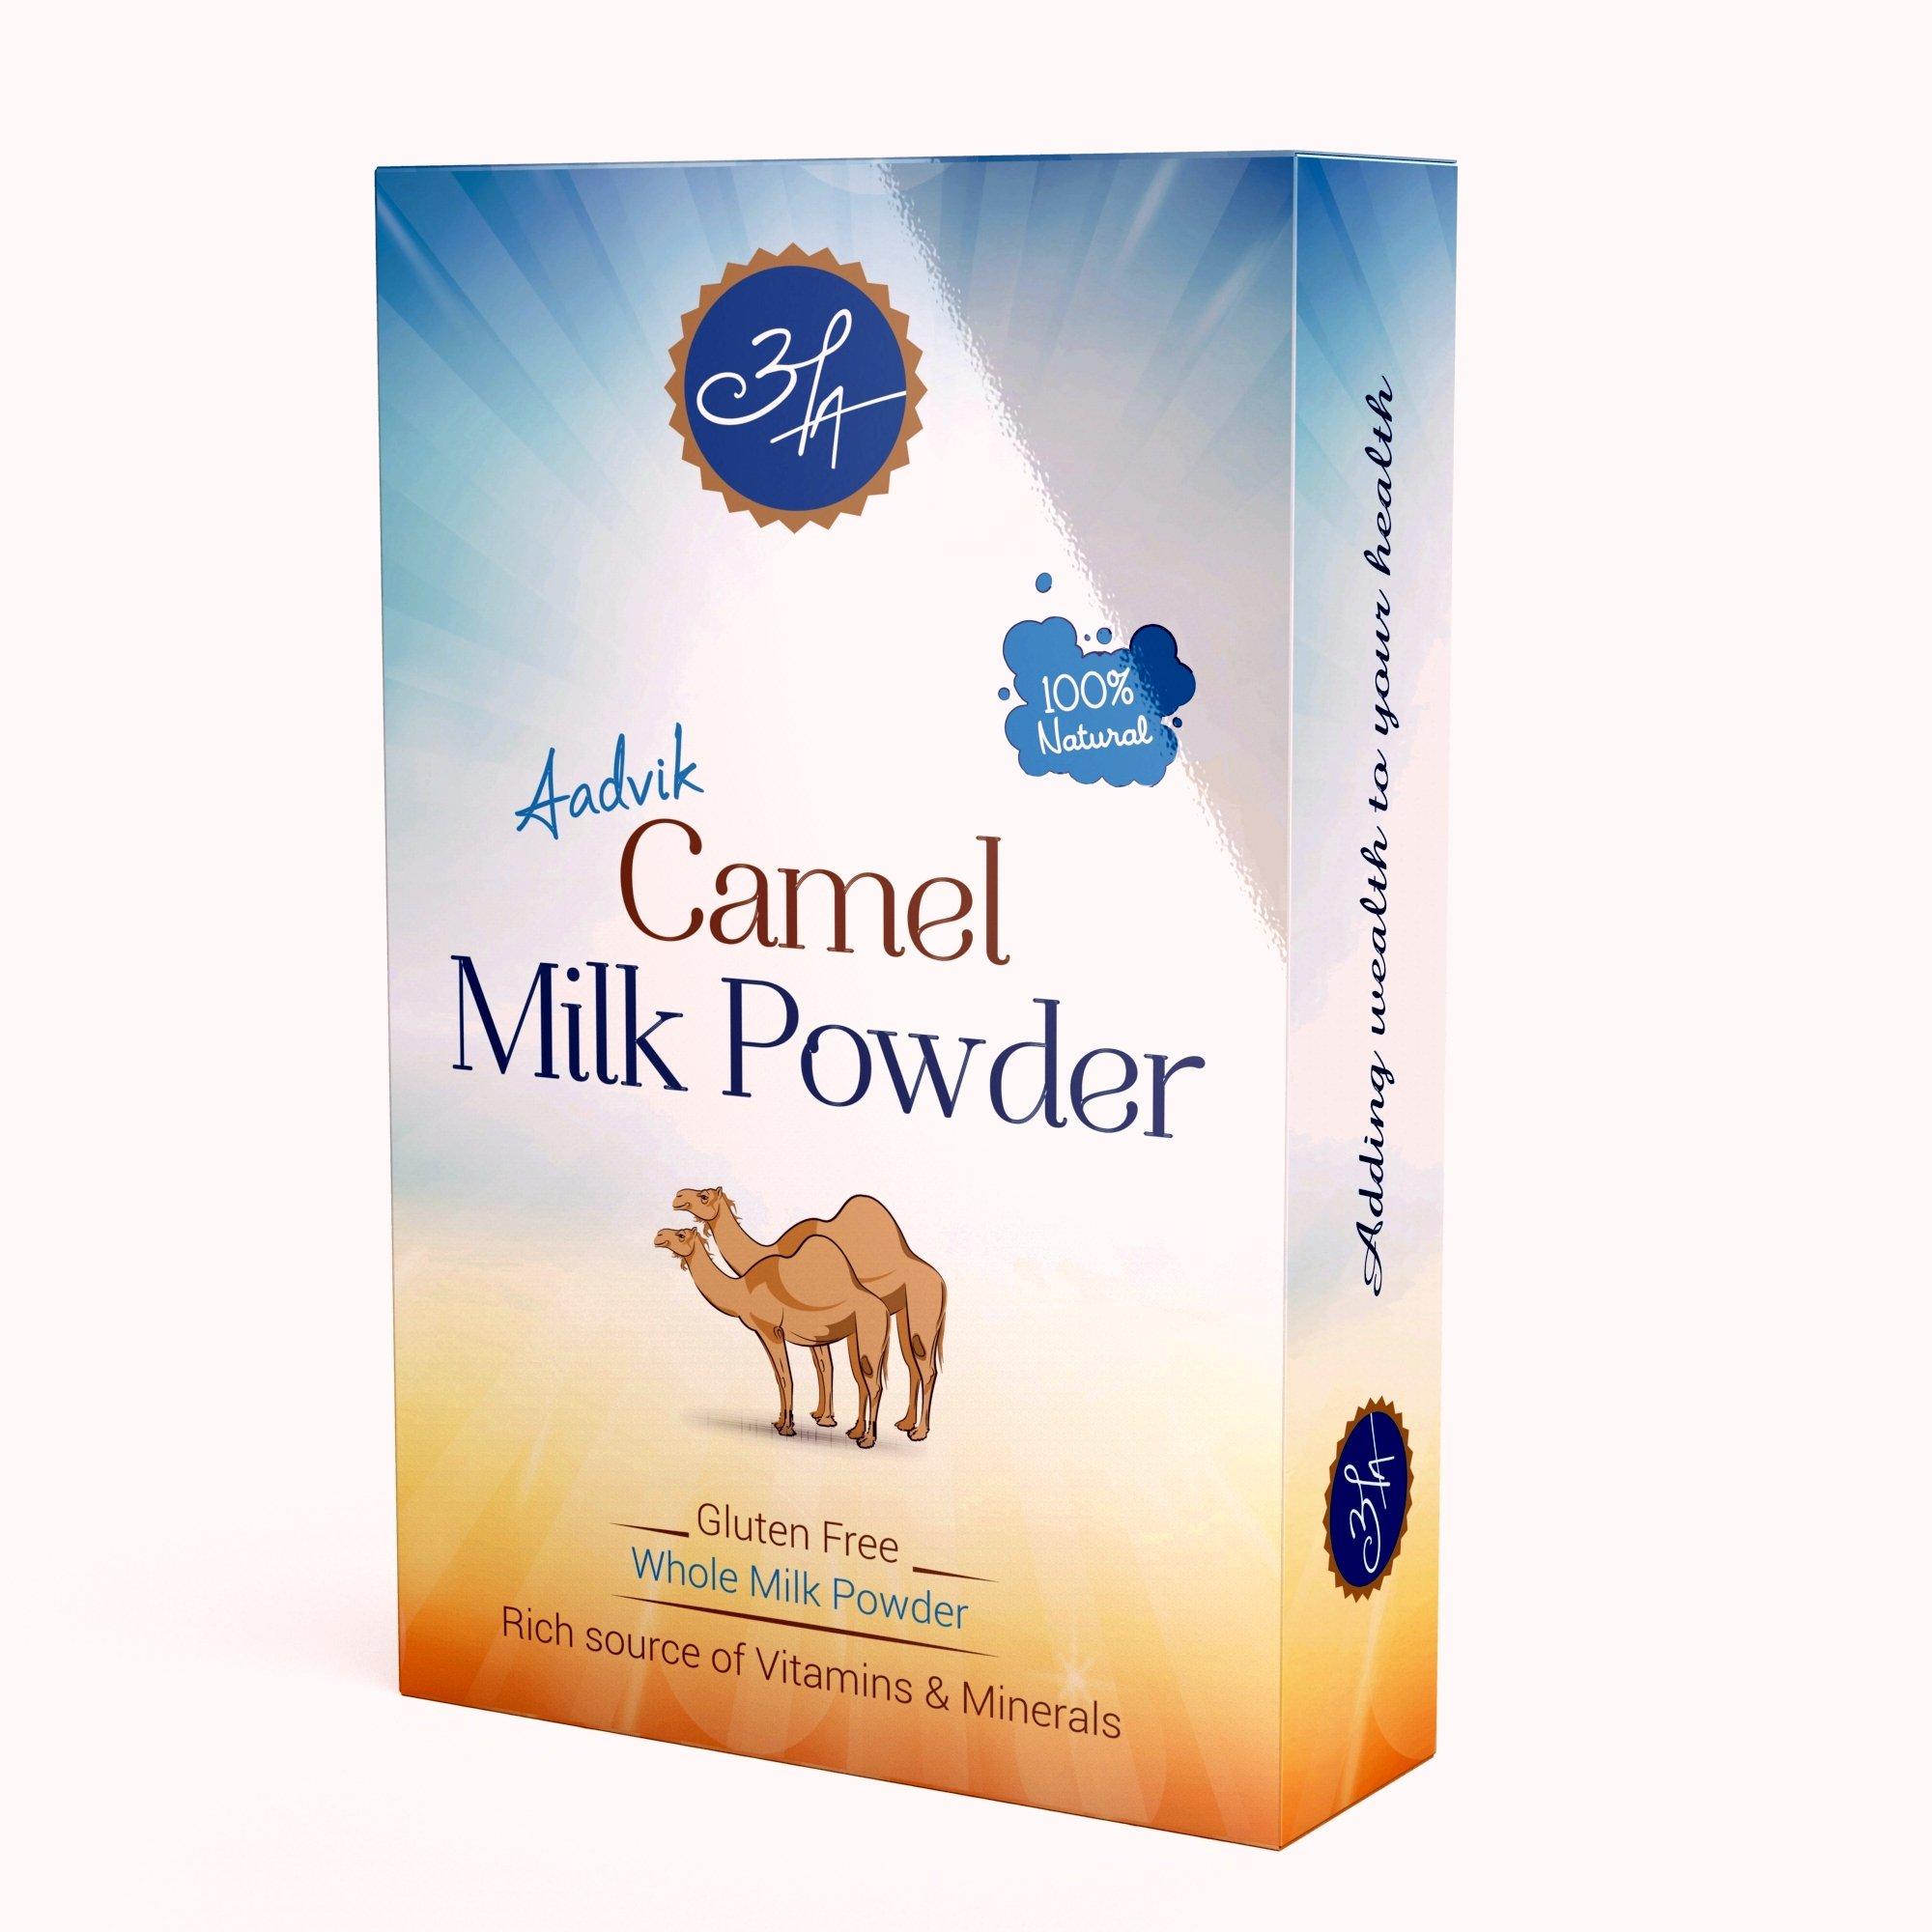 Aadvik Camel Milk Powder 0.7 Oz x 5 Servings (Freeze Dried, Gluten Free, No Additives) 3.5 Oz makes 35 fl oz